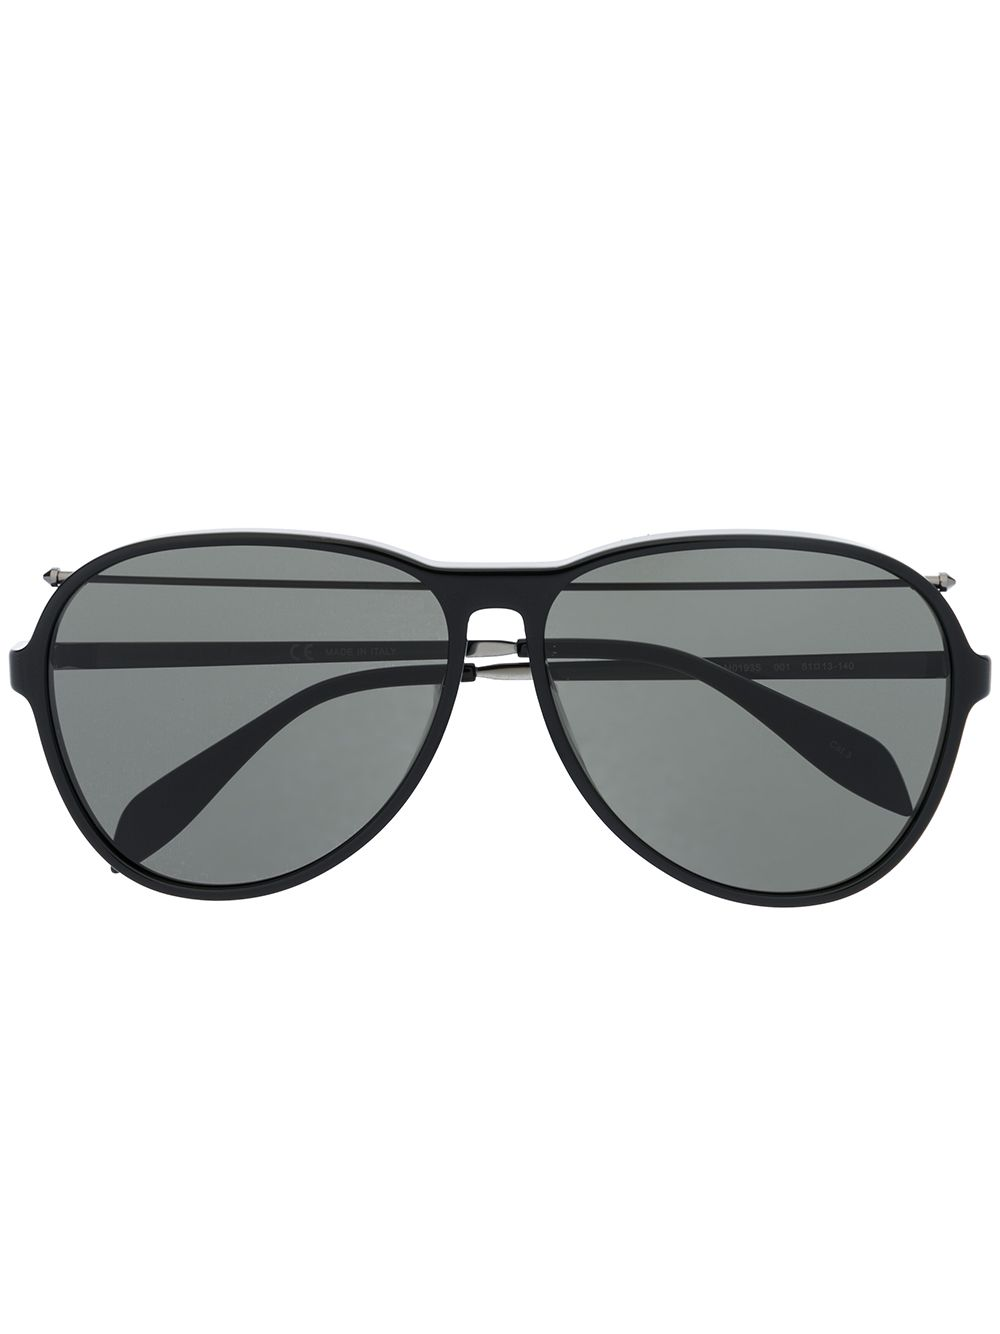 Am0193s Sunglasses